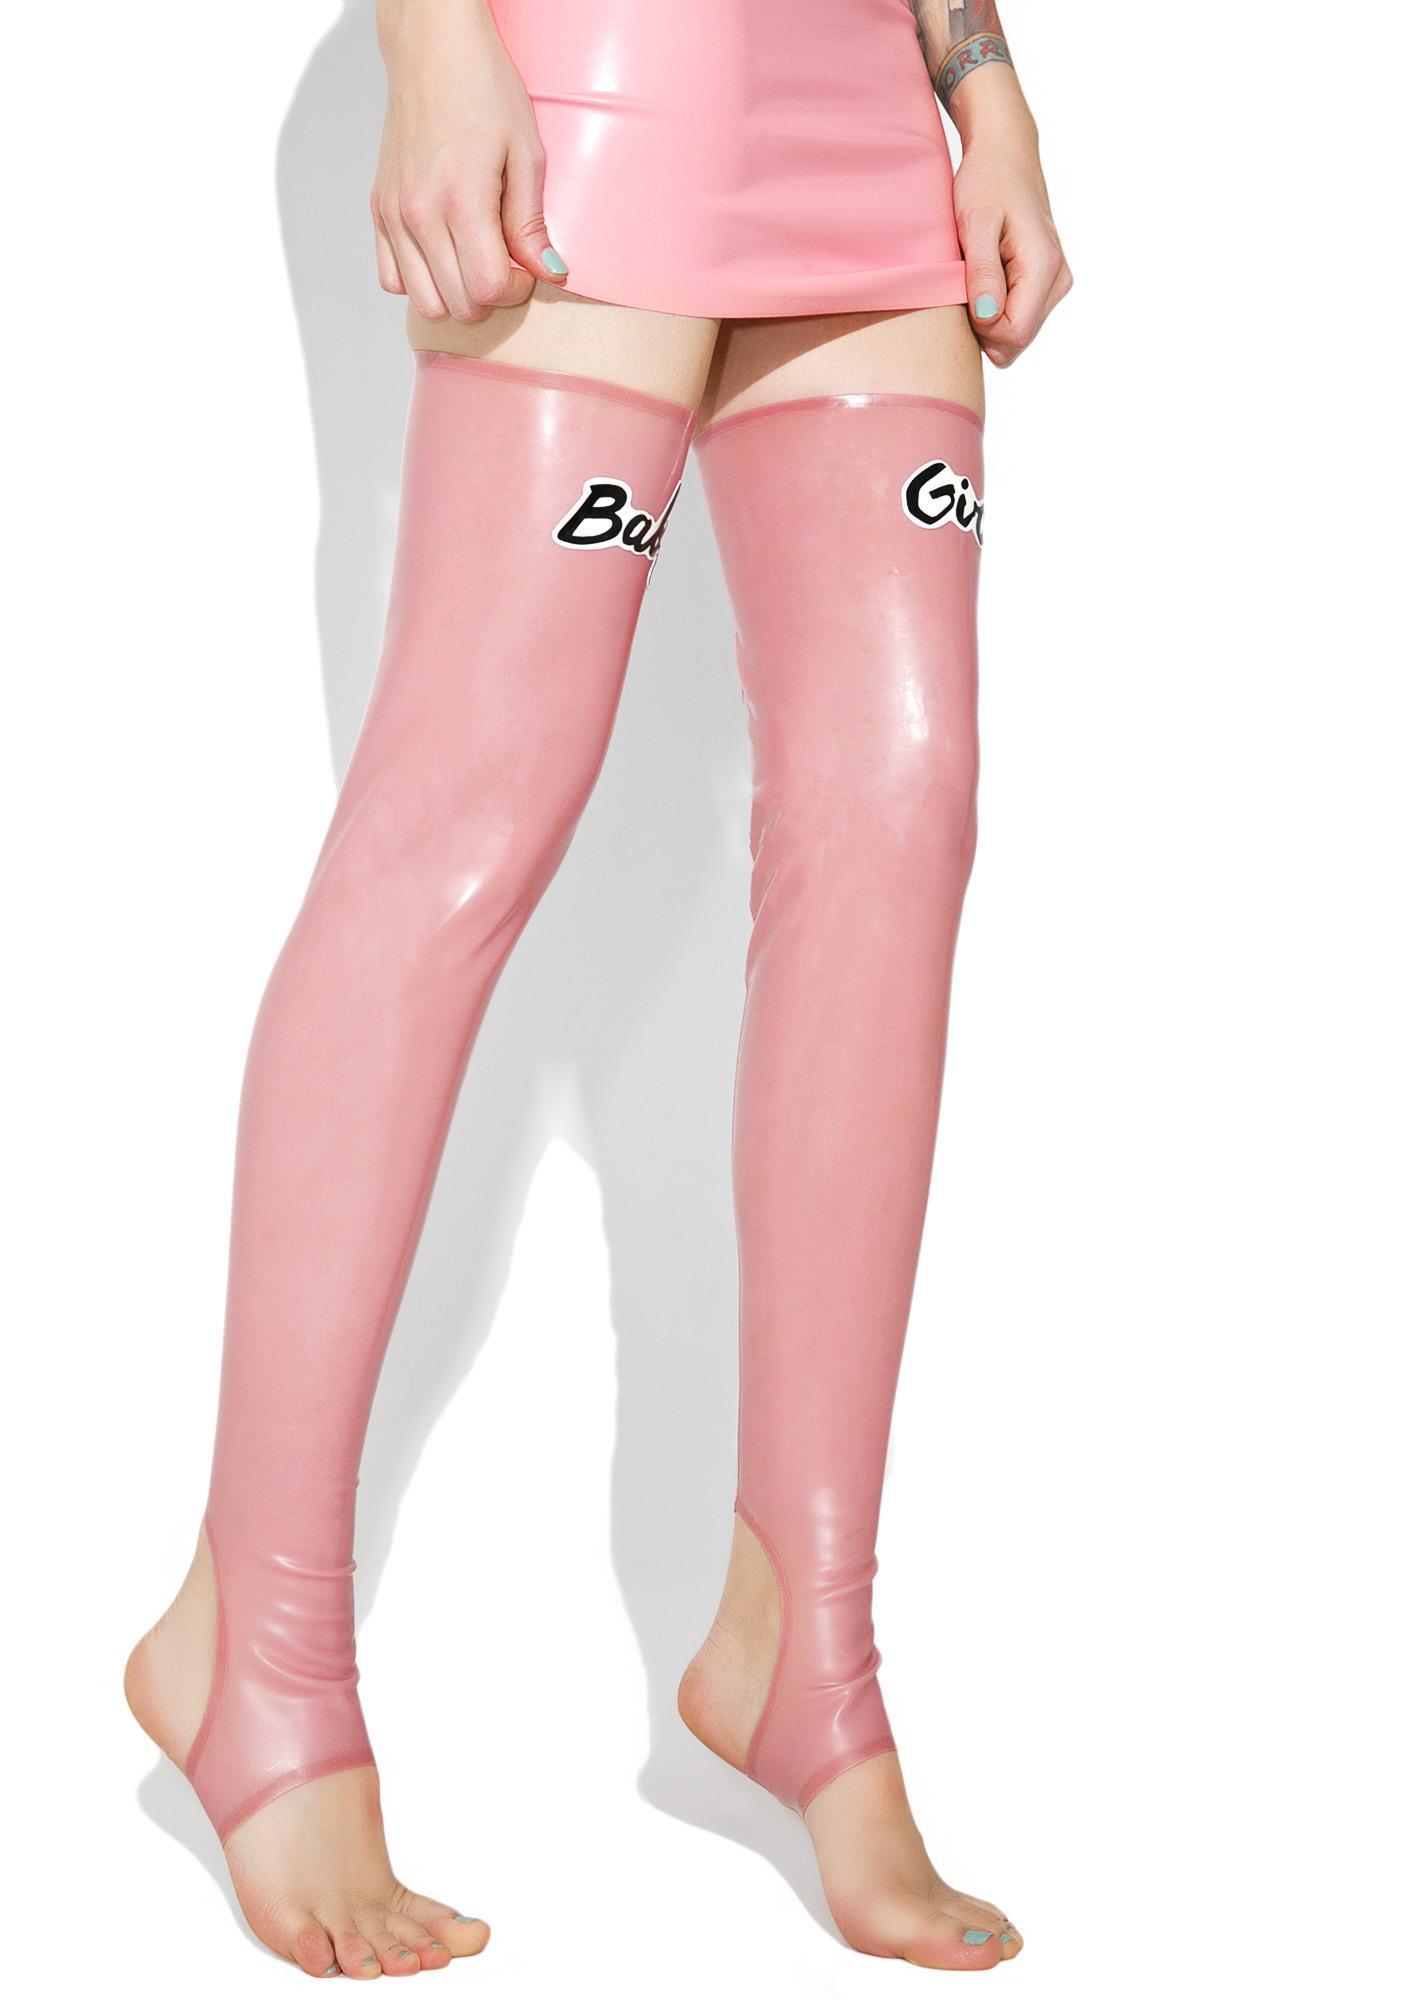 Meat Clothing Baby Girl Stirrup Socks